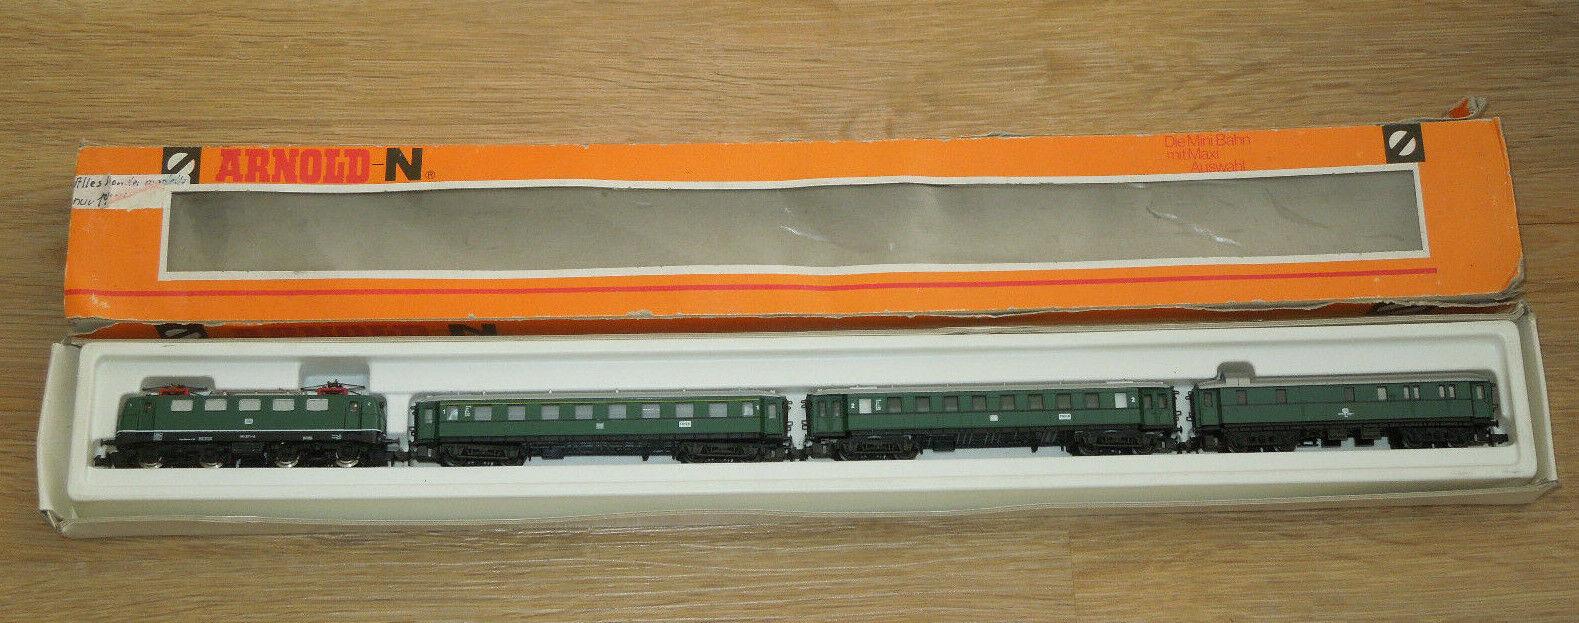 Arnold Spur N 0134 Personenzug 4 teilig mit E-Lok - Trier